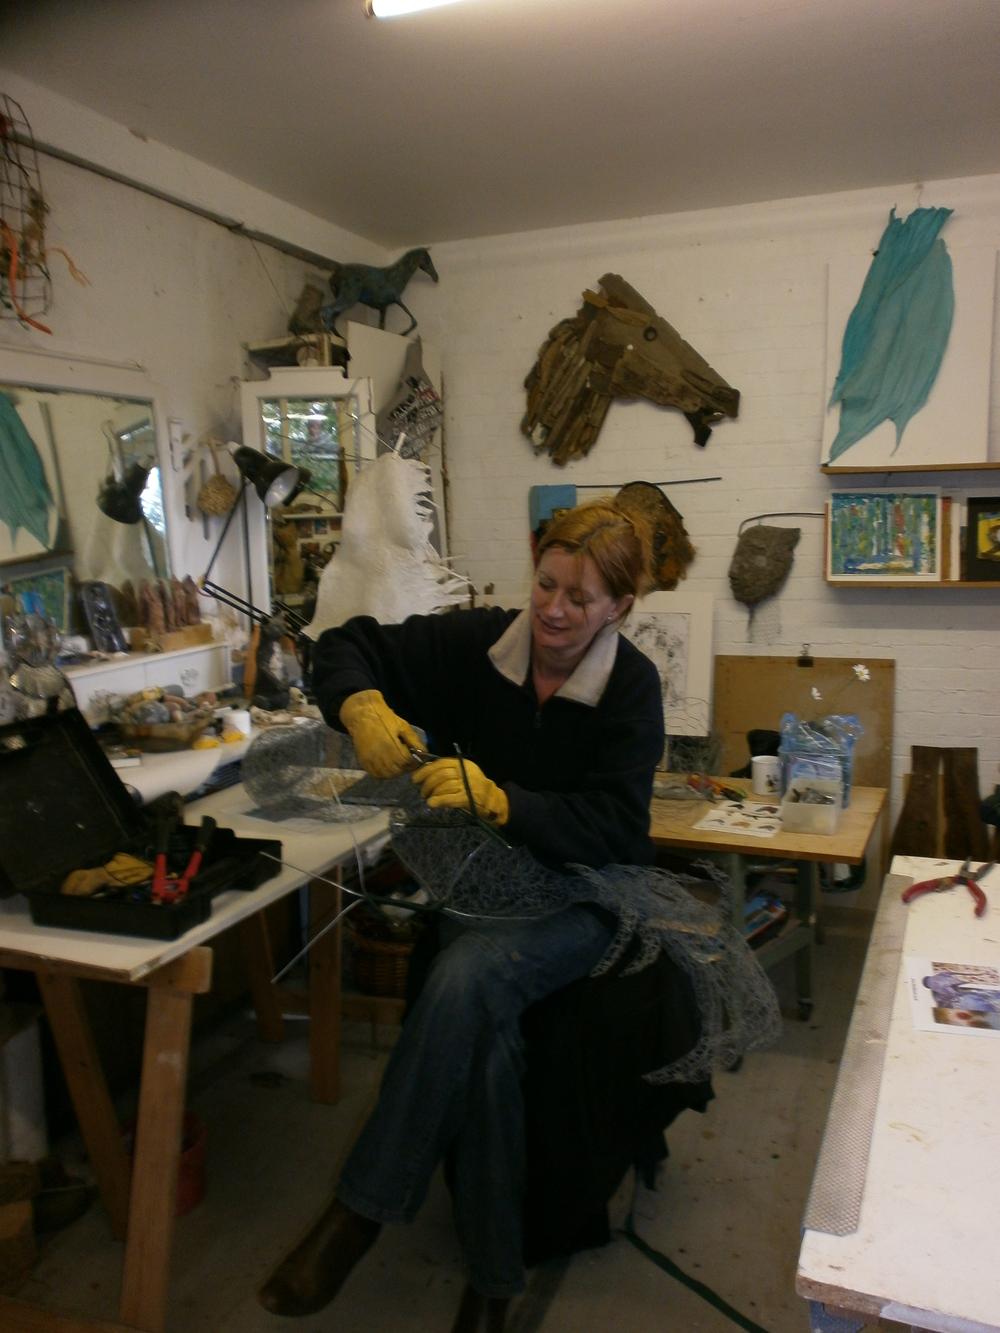 Working on 'Cockerel' in a fellow sculptors studio.